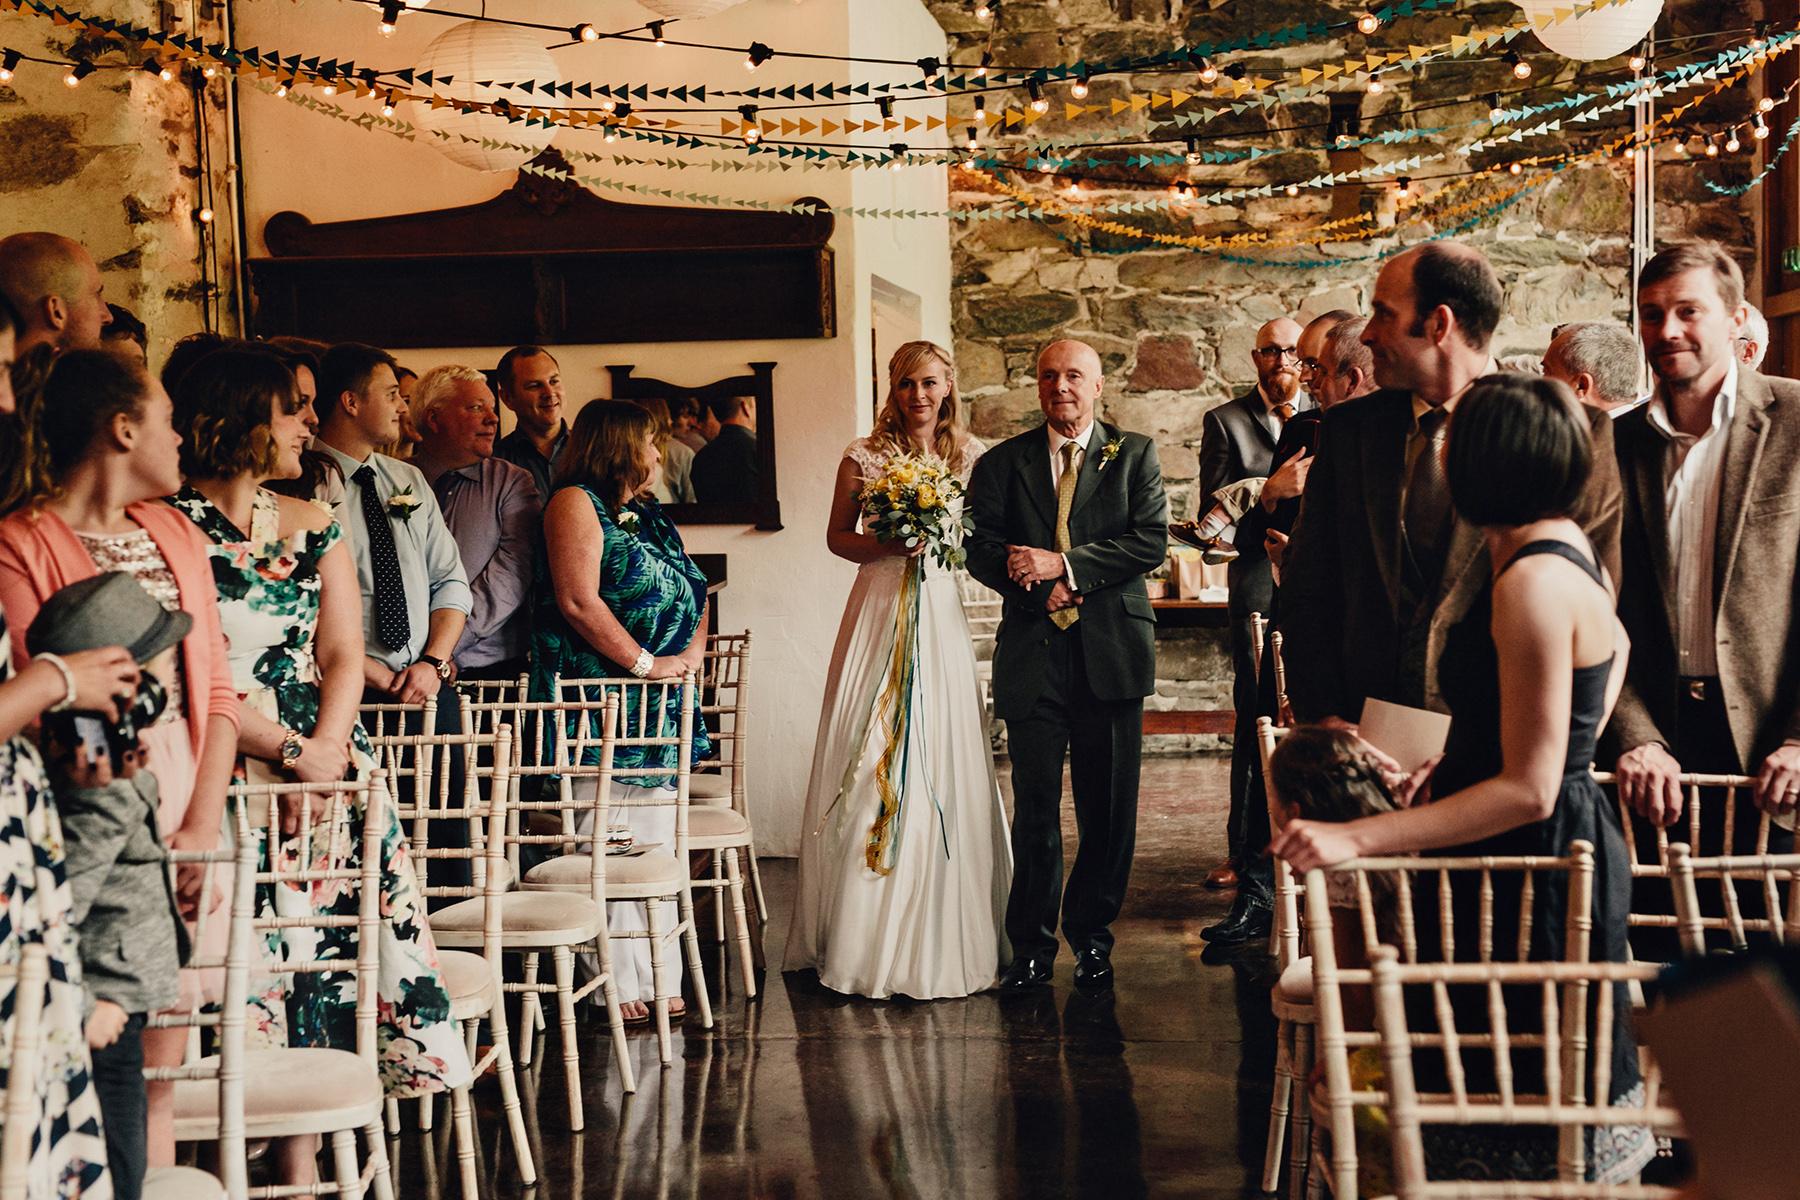 Snowdonia-Wales-Wedding-Photos-0315.jpg